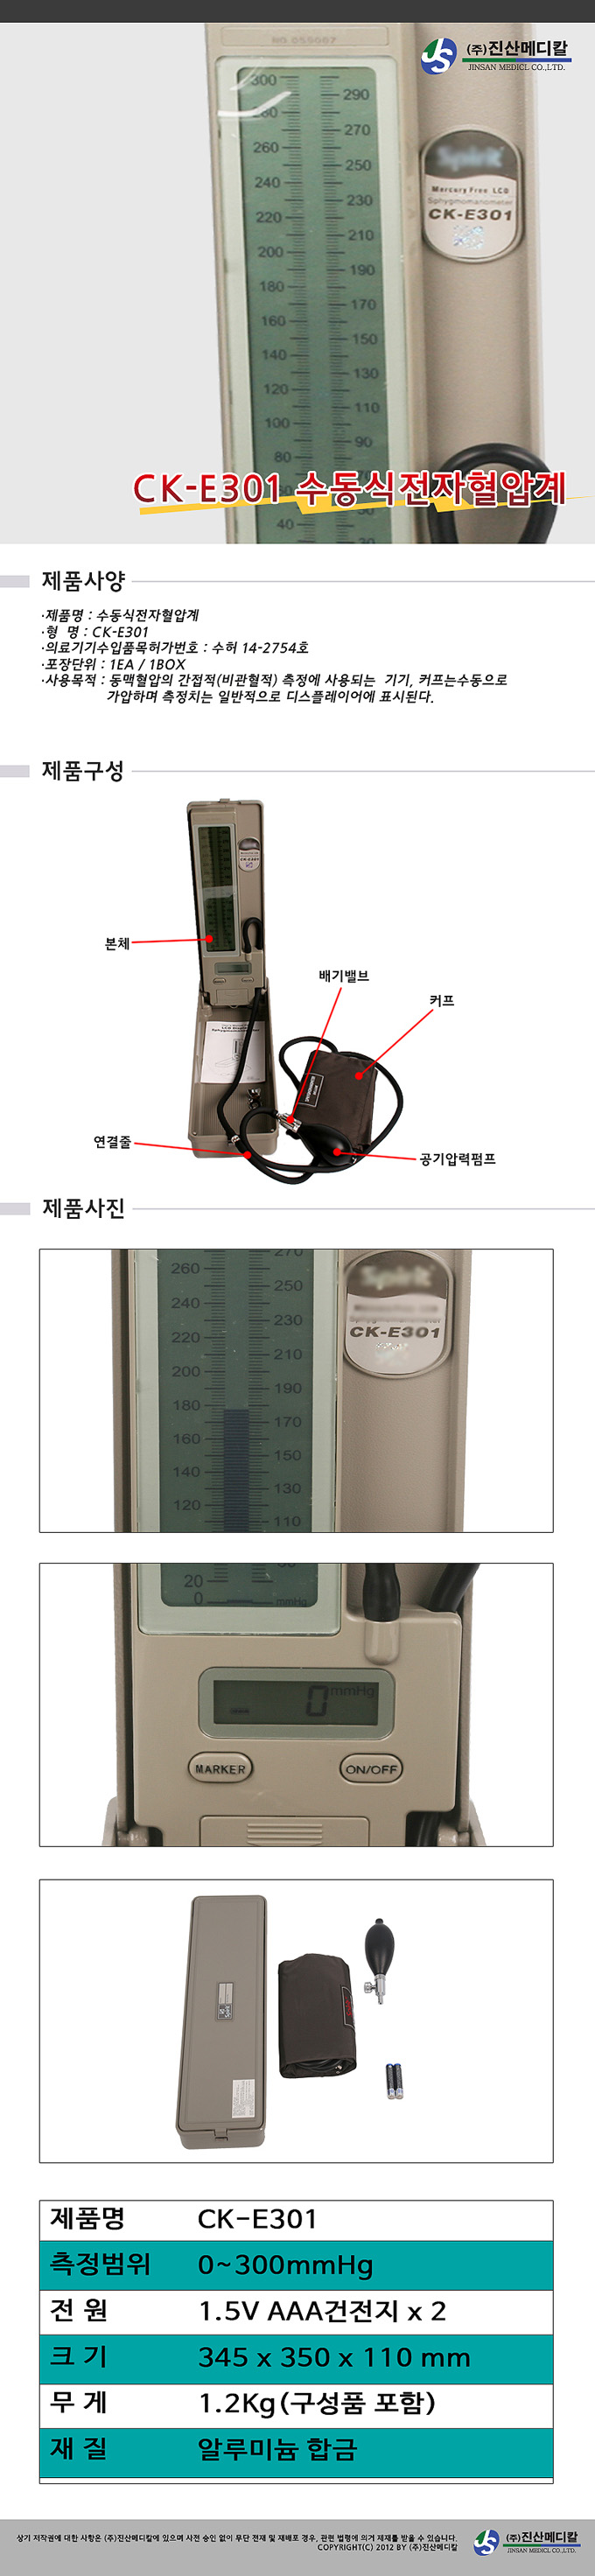 Spirit 스피릿 무수은혈압계 CK-E301